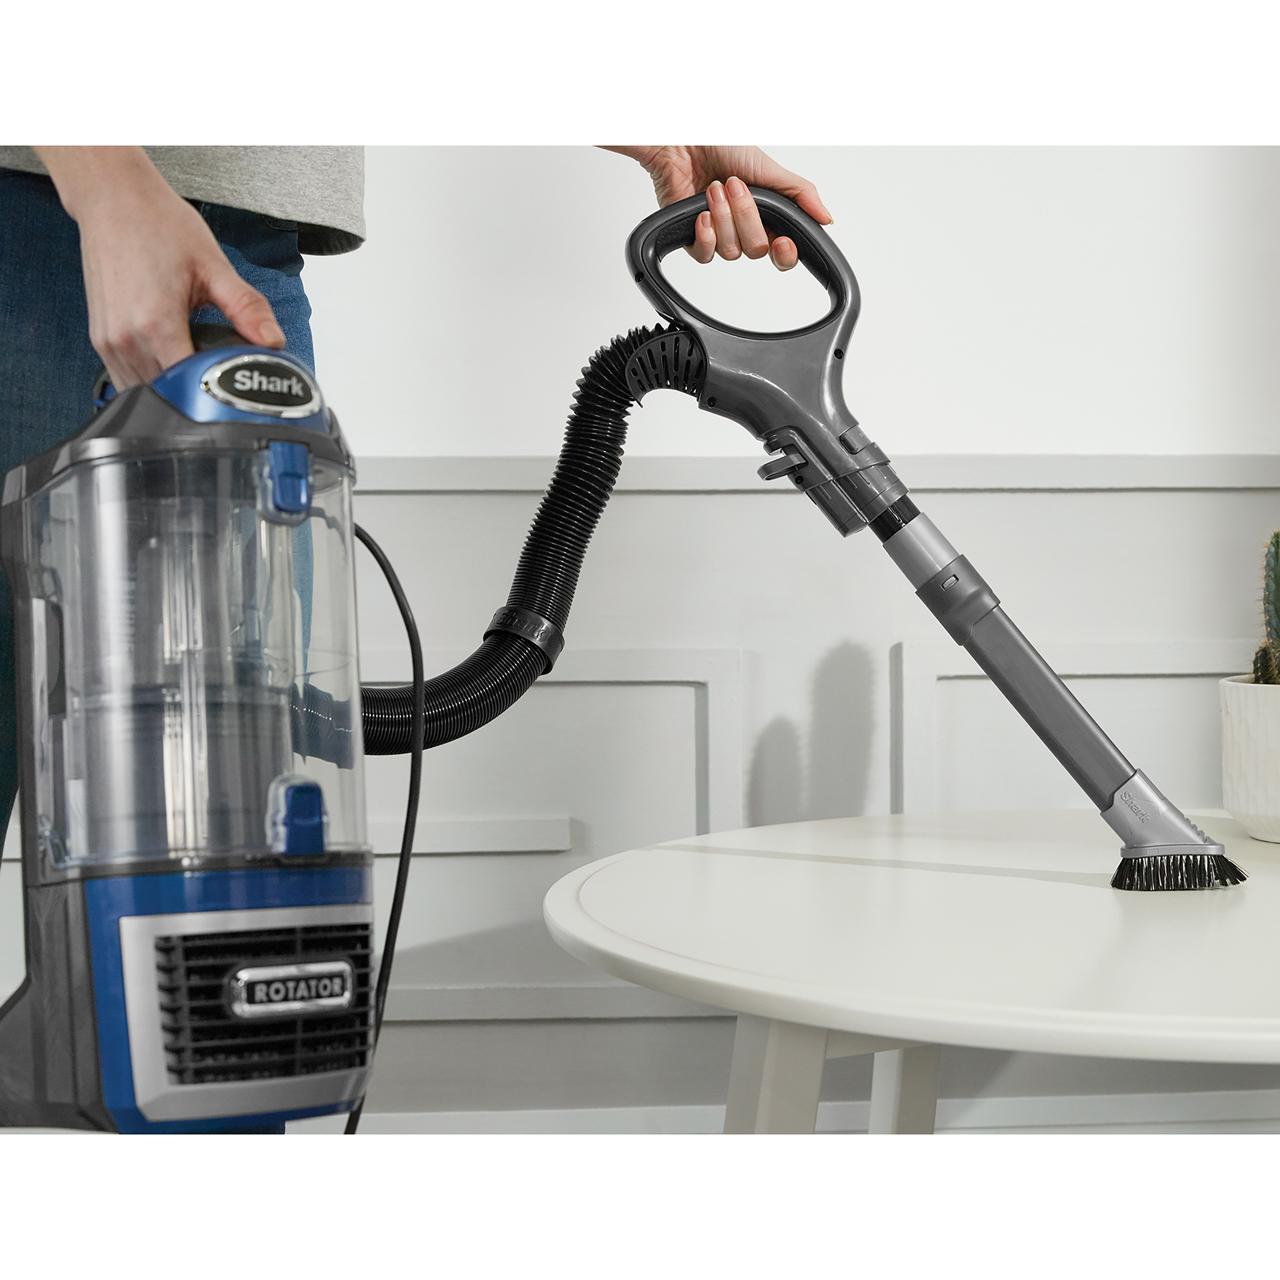 Shark Lift Away Upright Vacuum Cleaner Hepa Filter Bagless Year Ebay